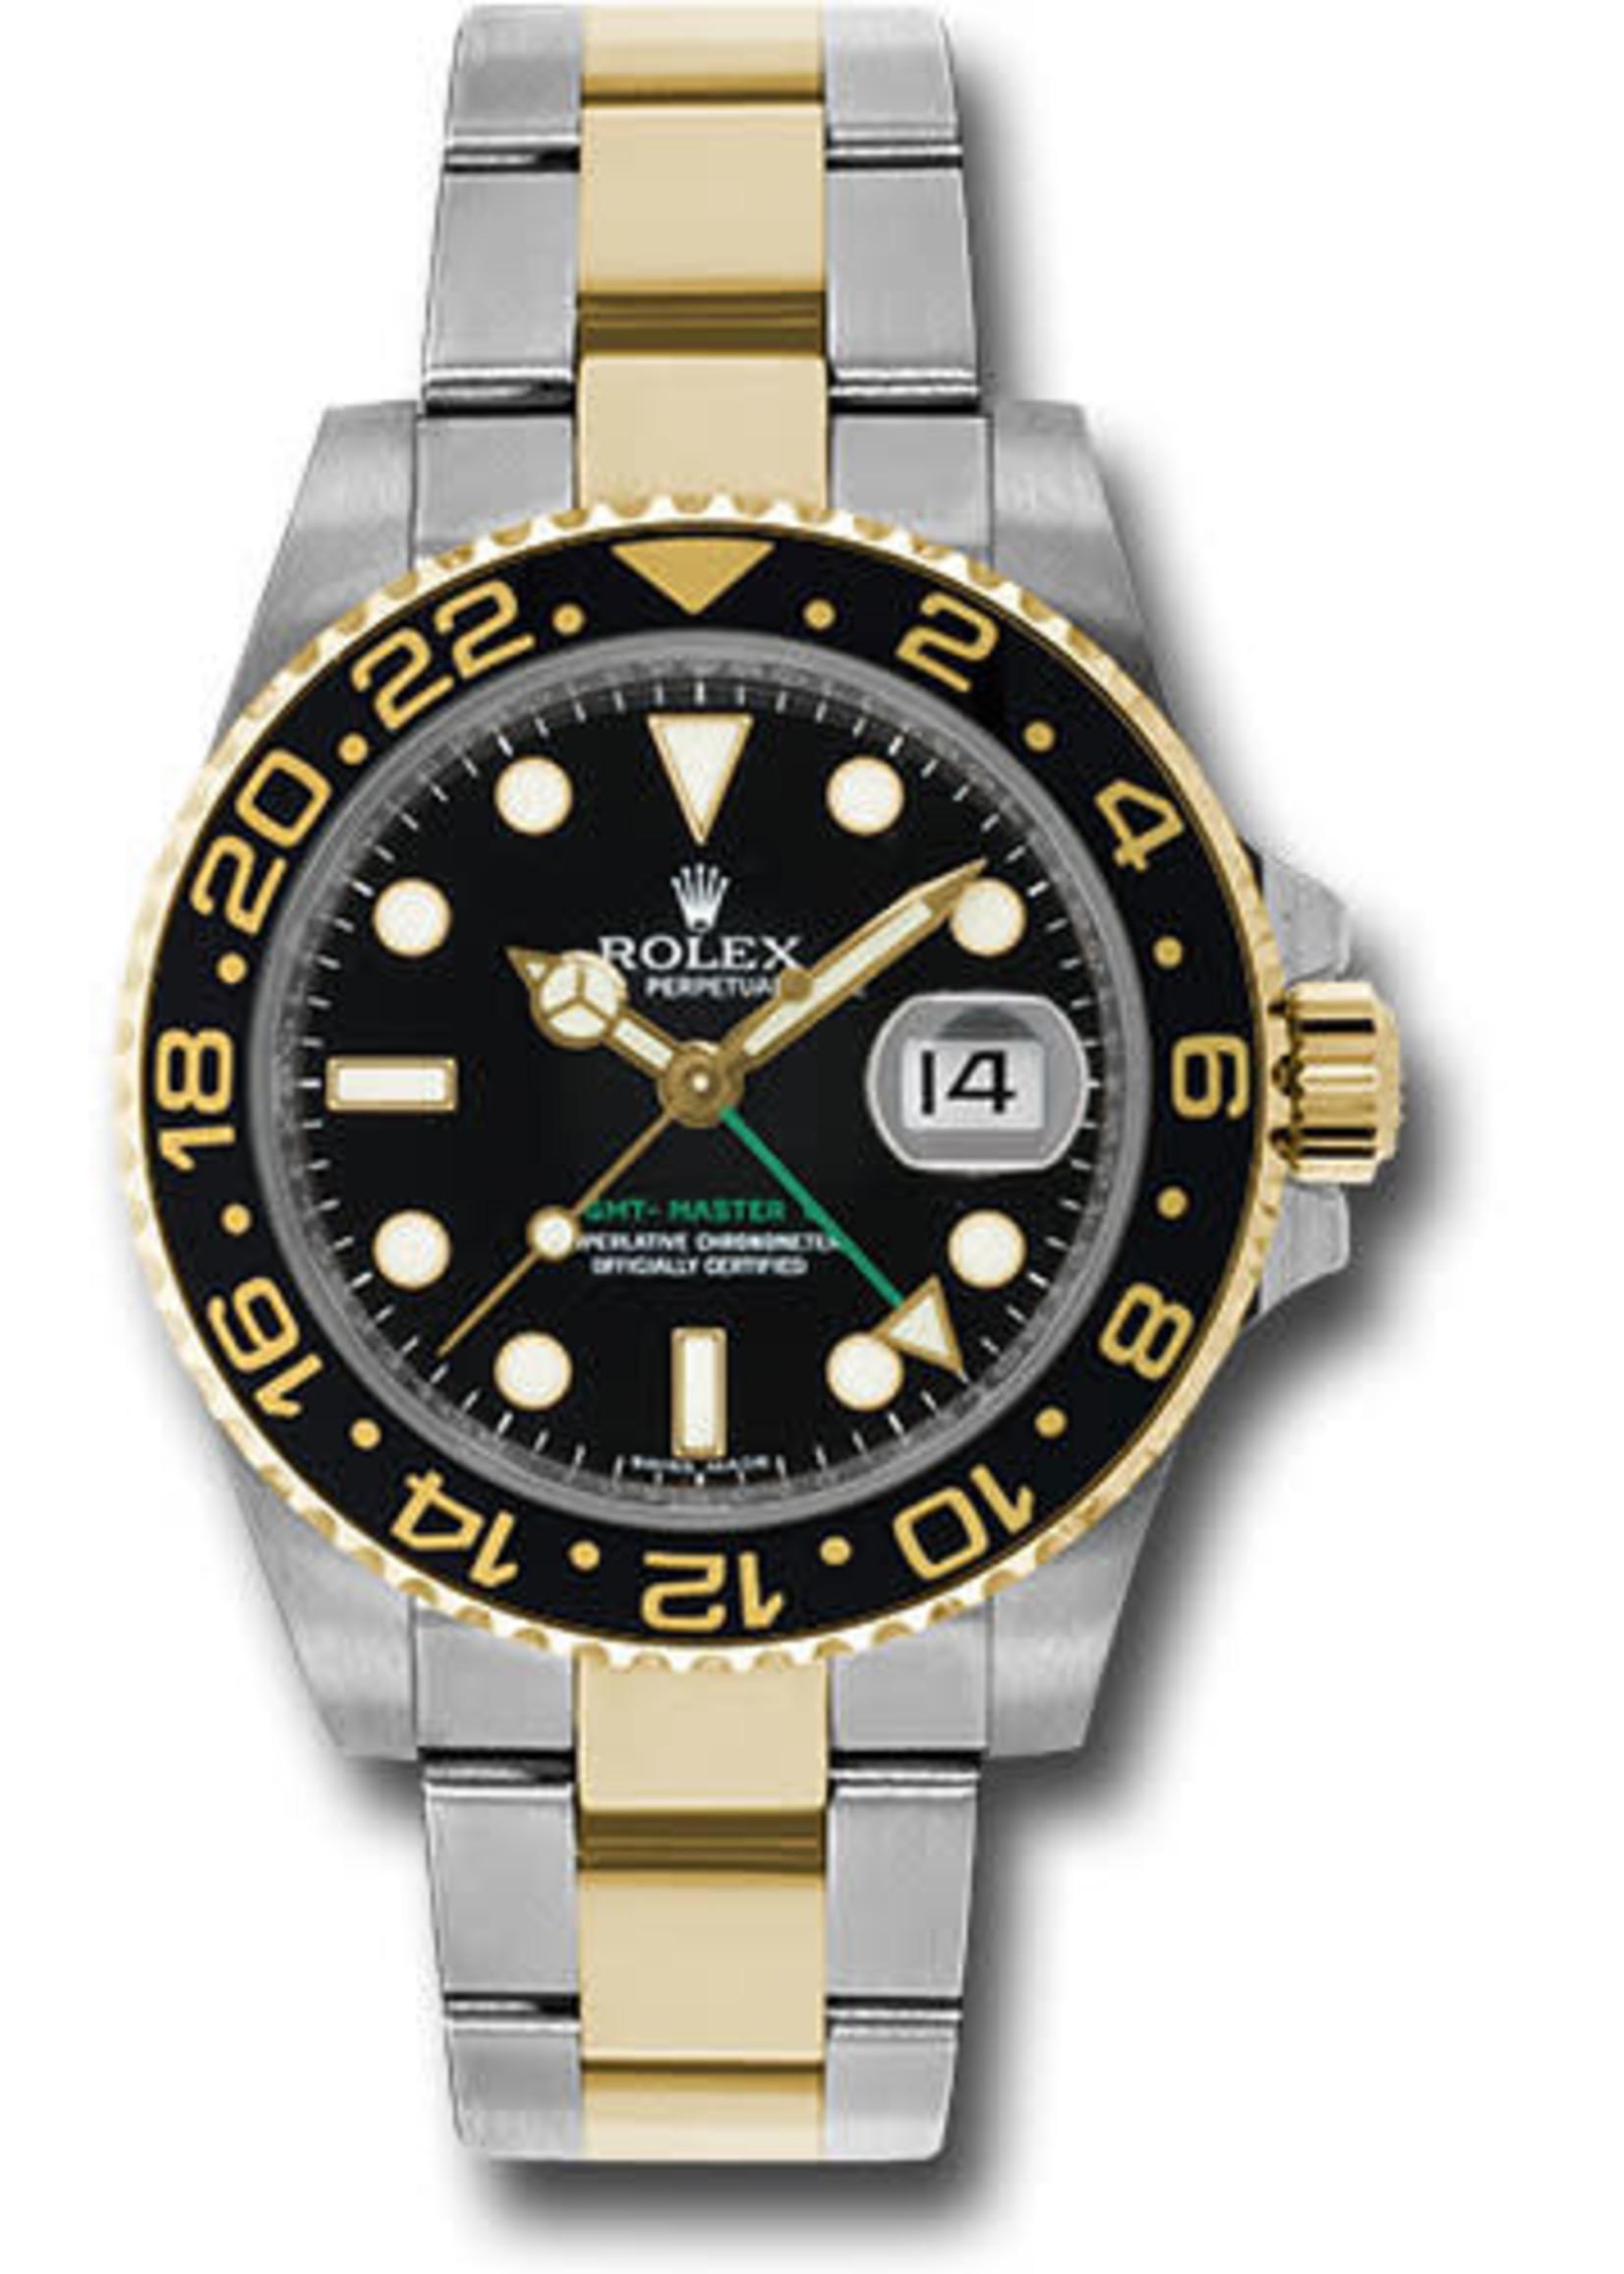 Rolex Rolex GMT-Master II 40MM #116713LN (2017 B+P)